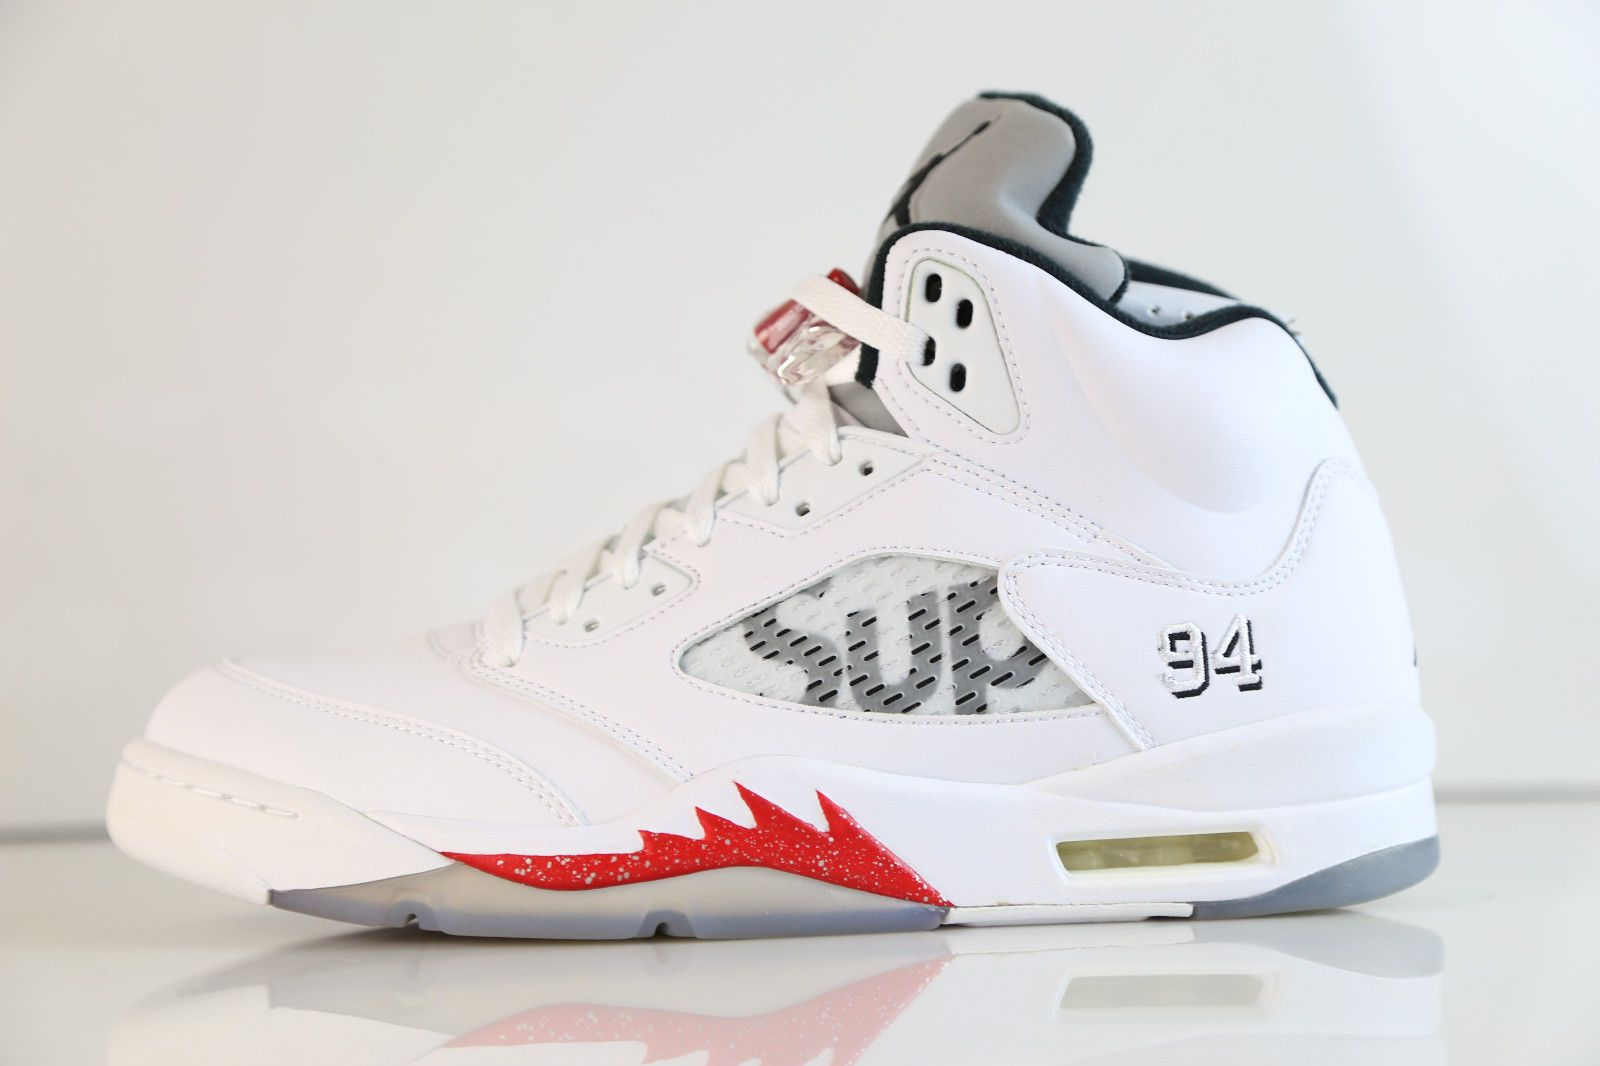 Nike Air Jordan 11 Low Blanco US 105 Lab Off Blanco Low Boost Supreme Max Force Yeezy Bulls 139c13